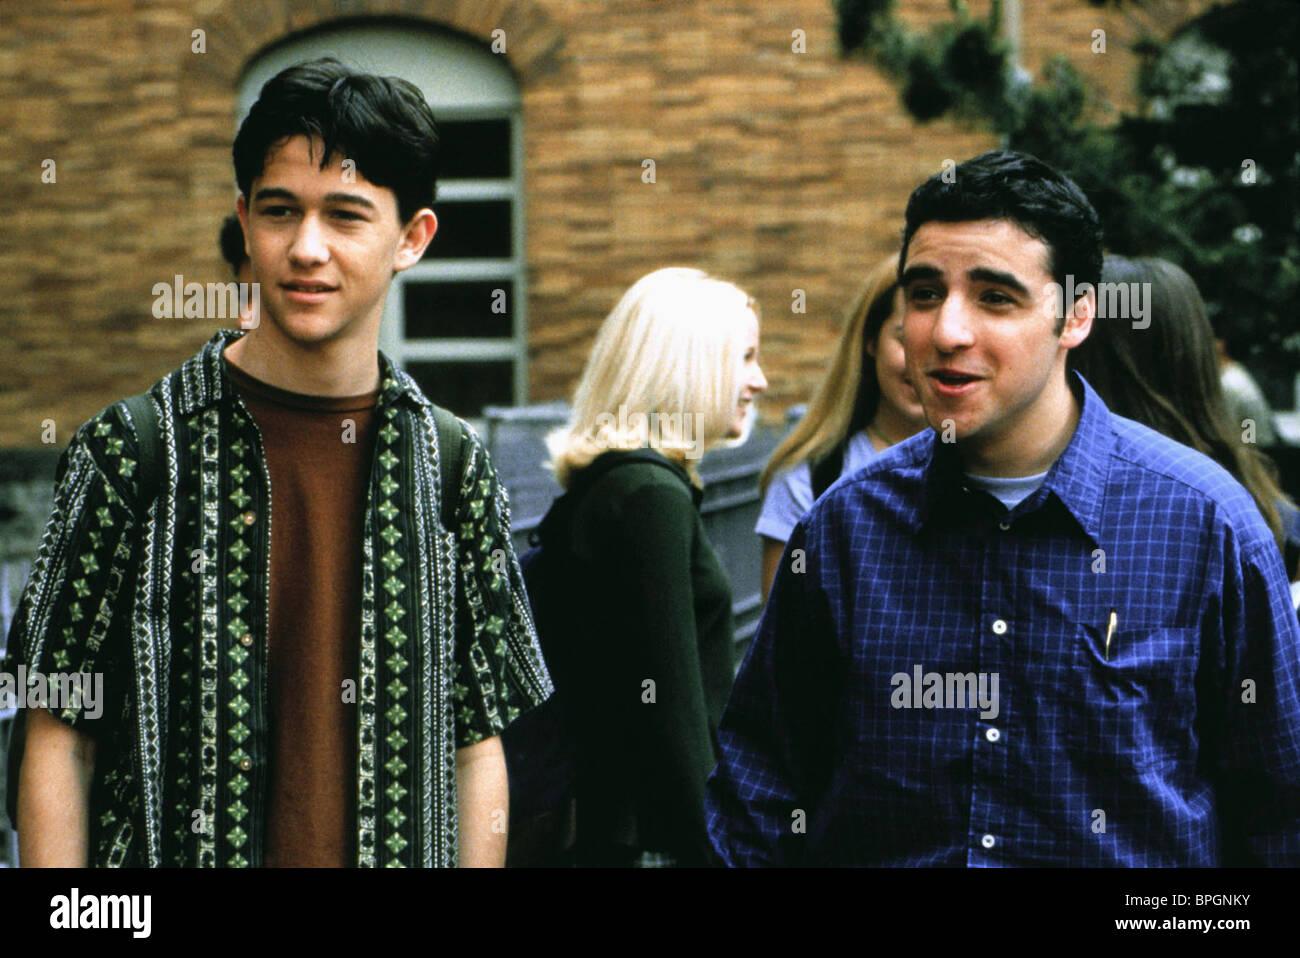 10 Things I Hate About You 1999: JOSEPH GORDON-LEVITT & DAVID KRUMHOLTZ 10 THINGS I HATE